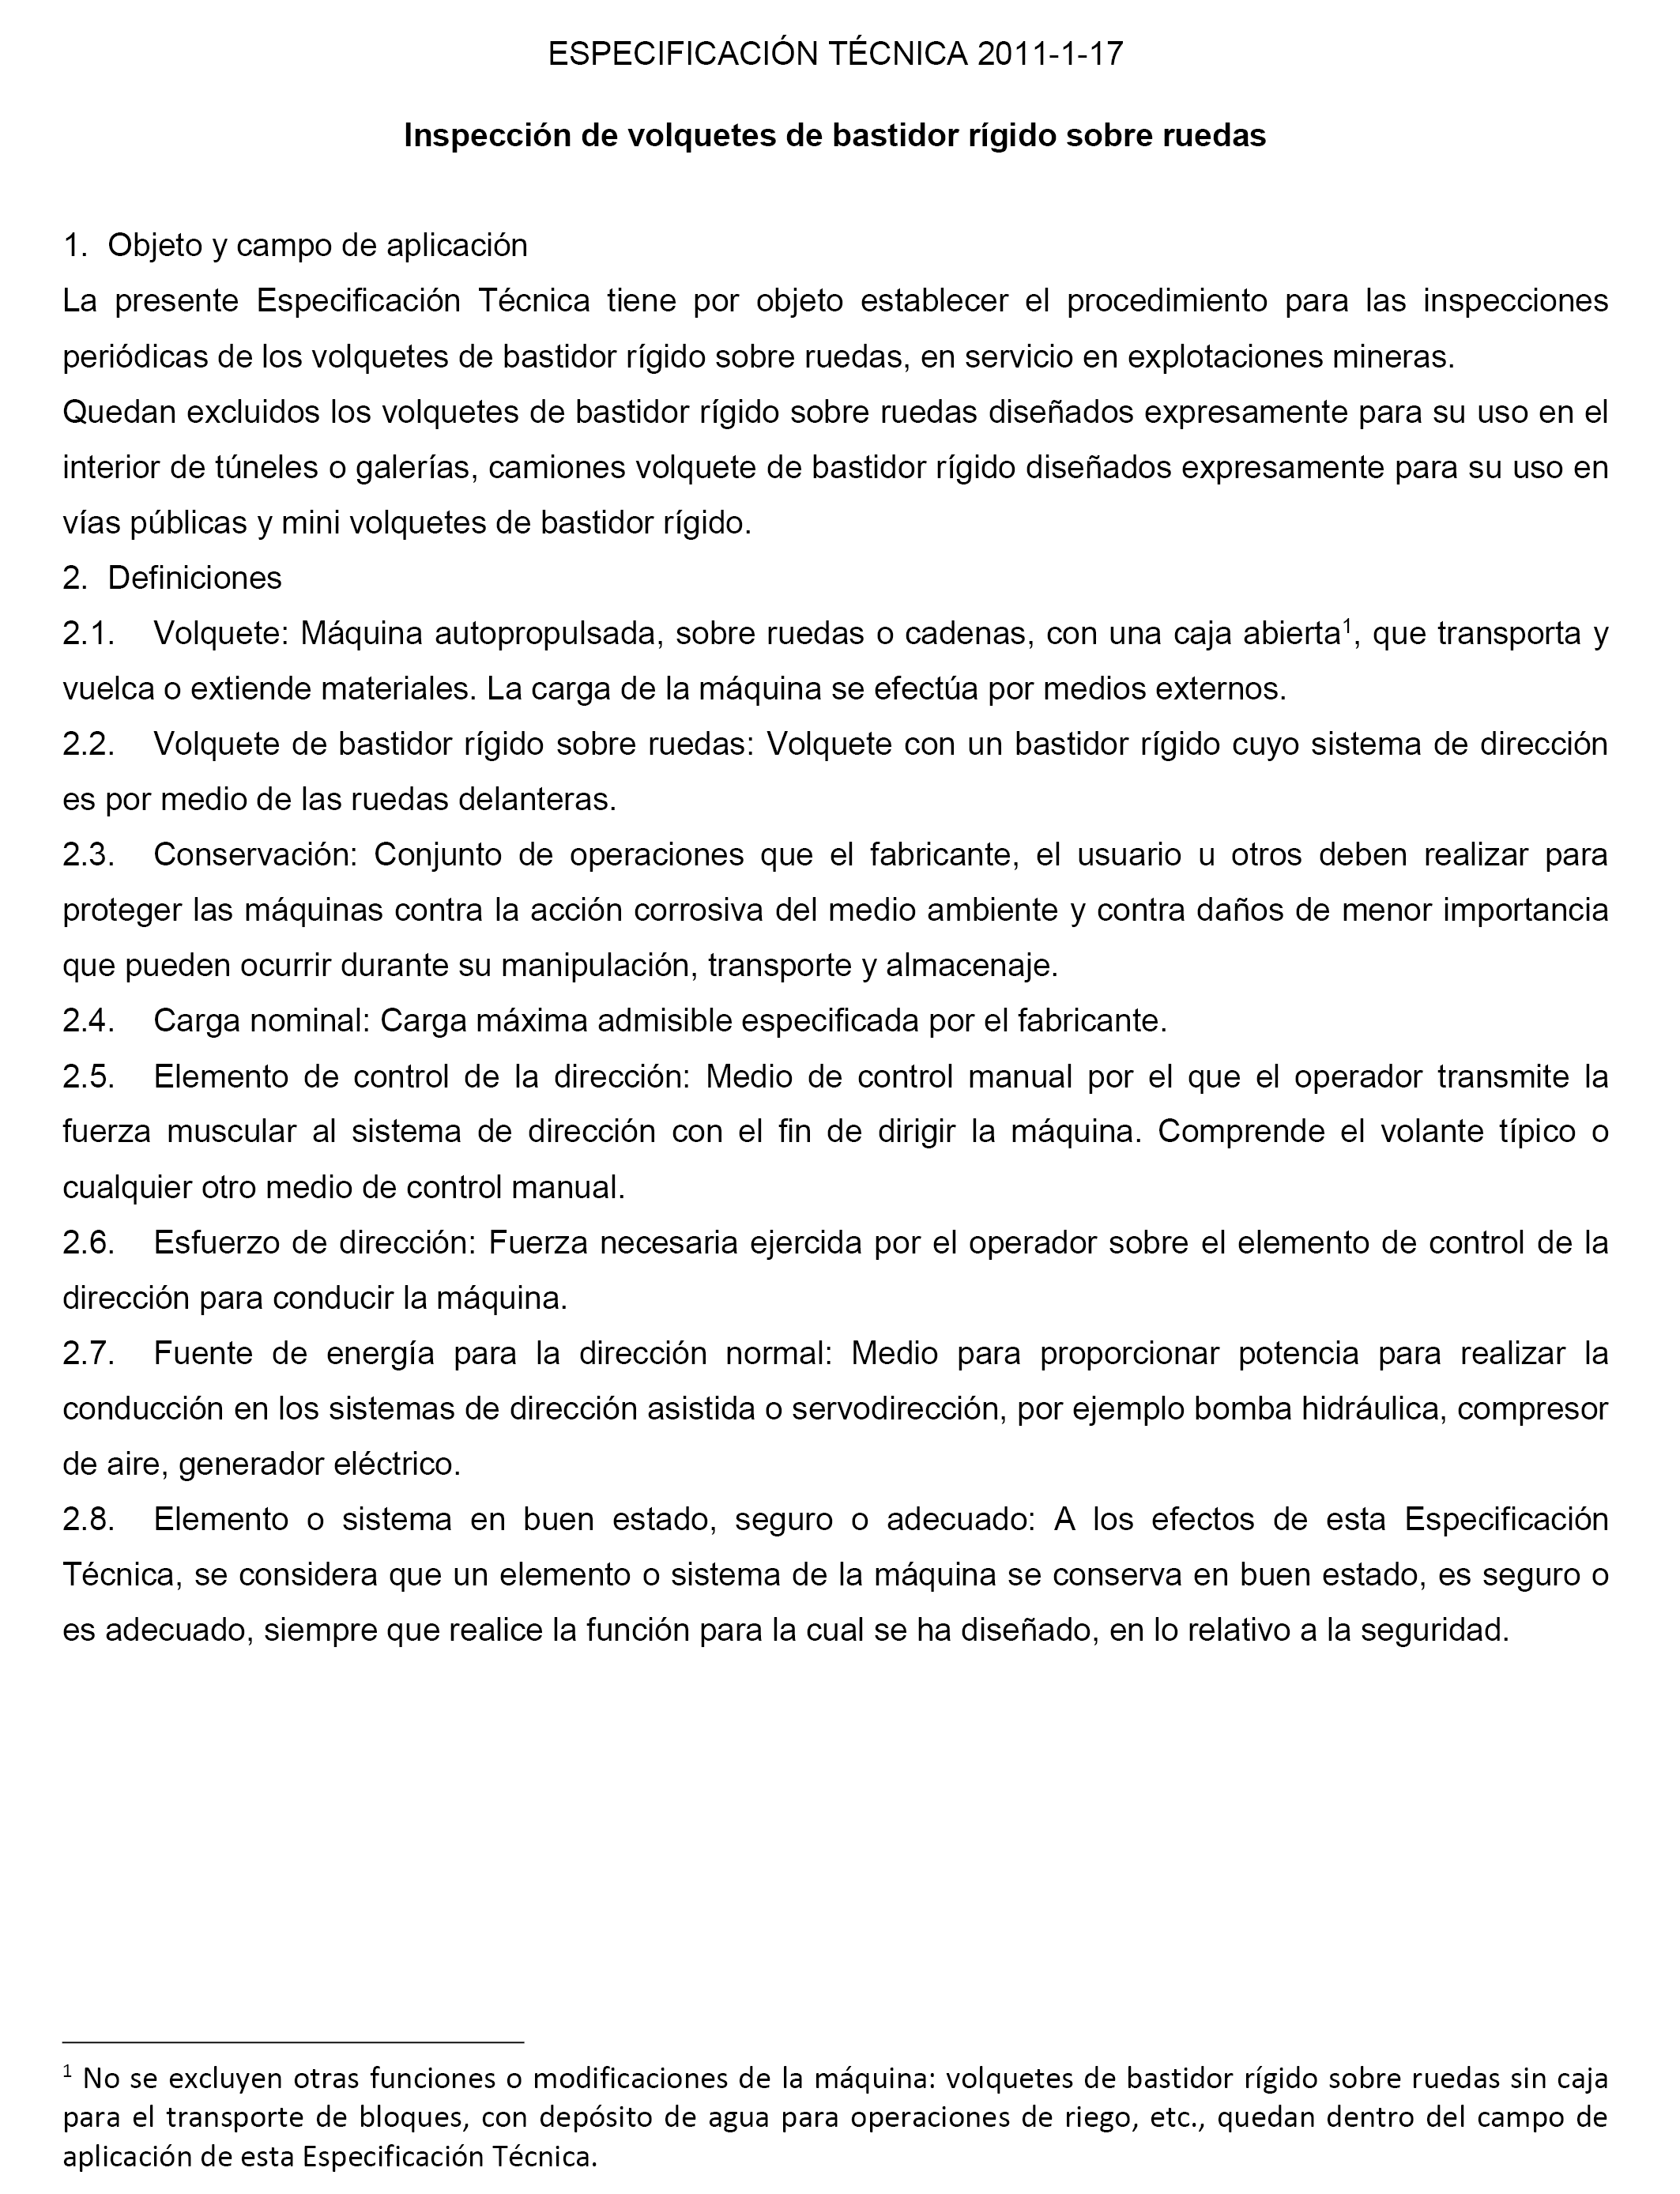 BOE.es - Documento BOE-A-2017-11053